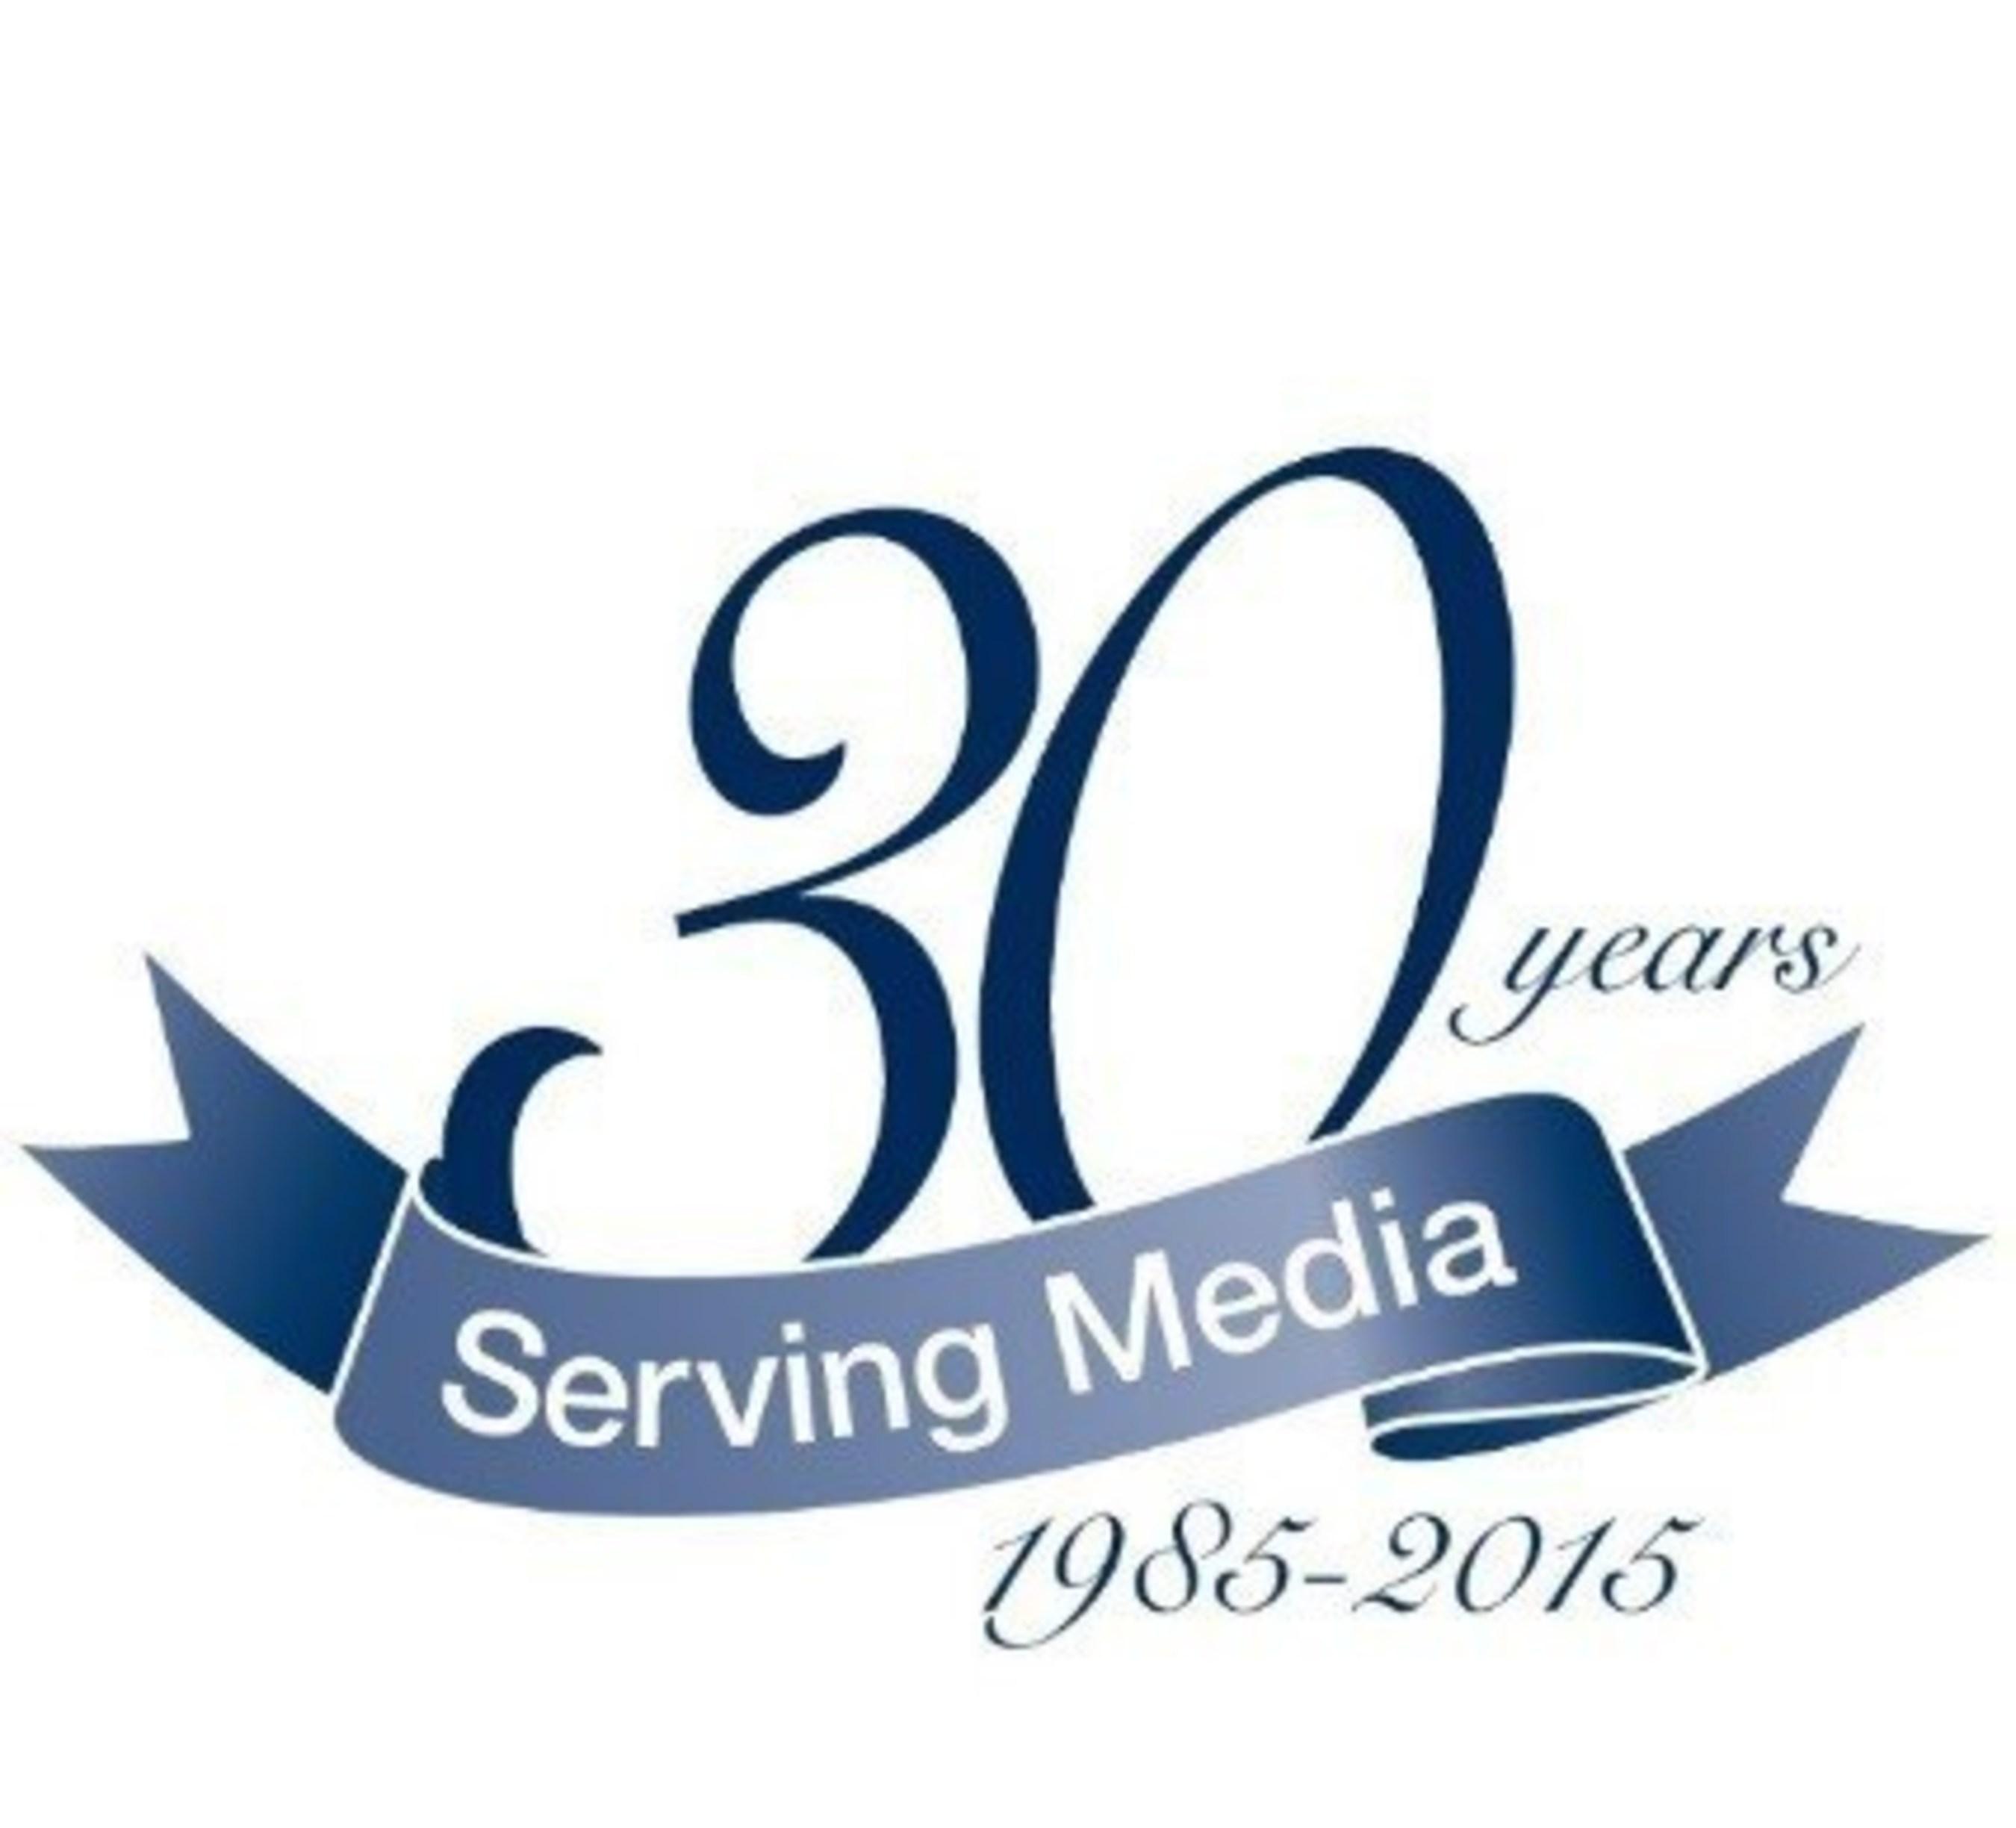 Mastermedia International Hosts 30th Anniversary Celebration